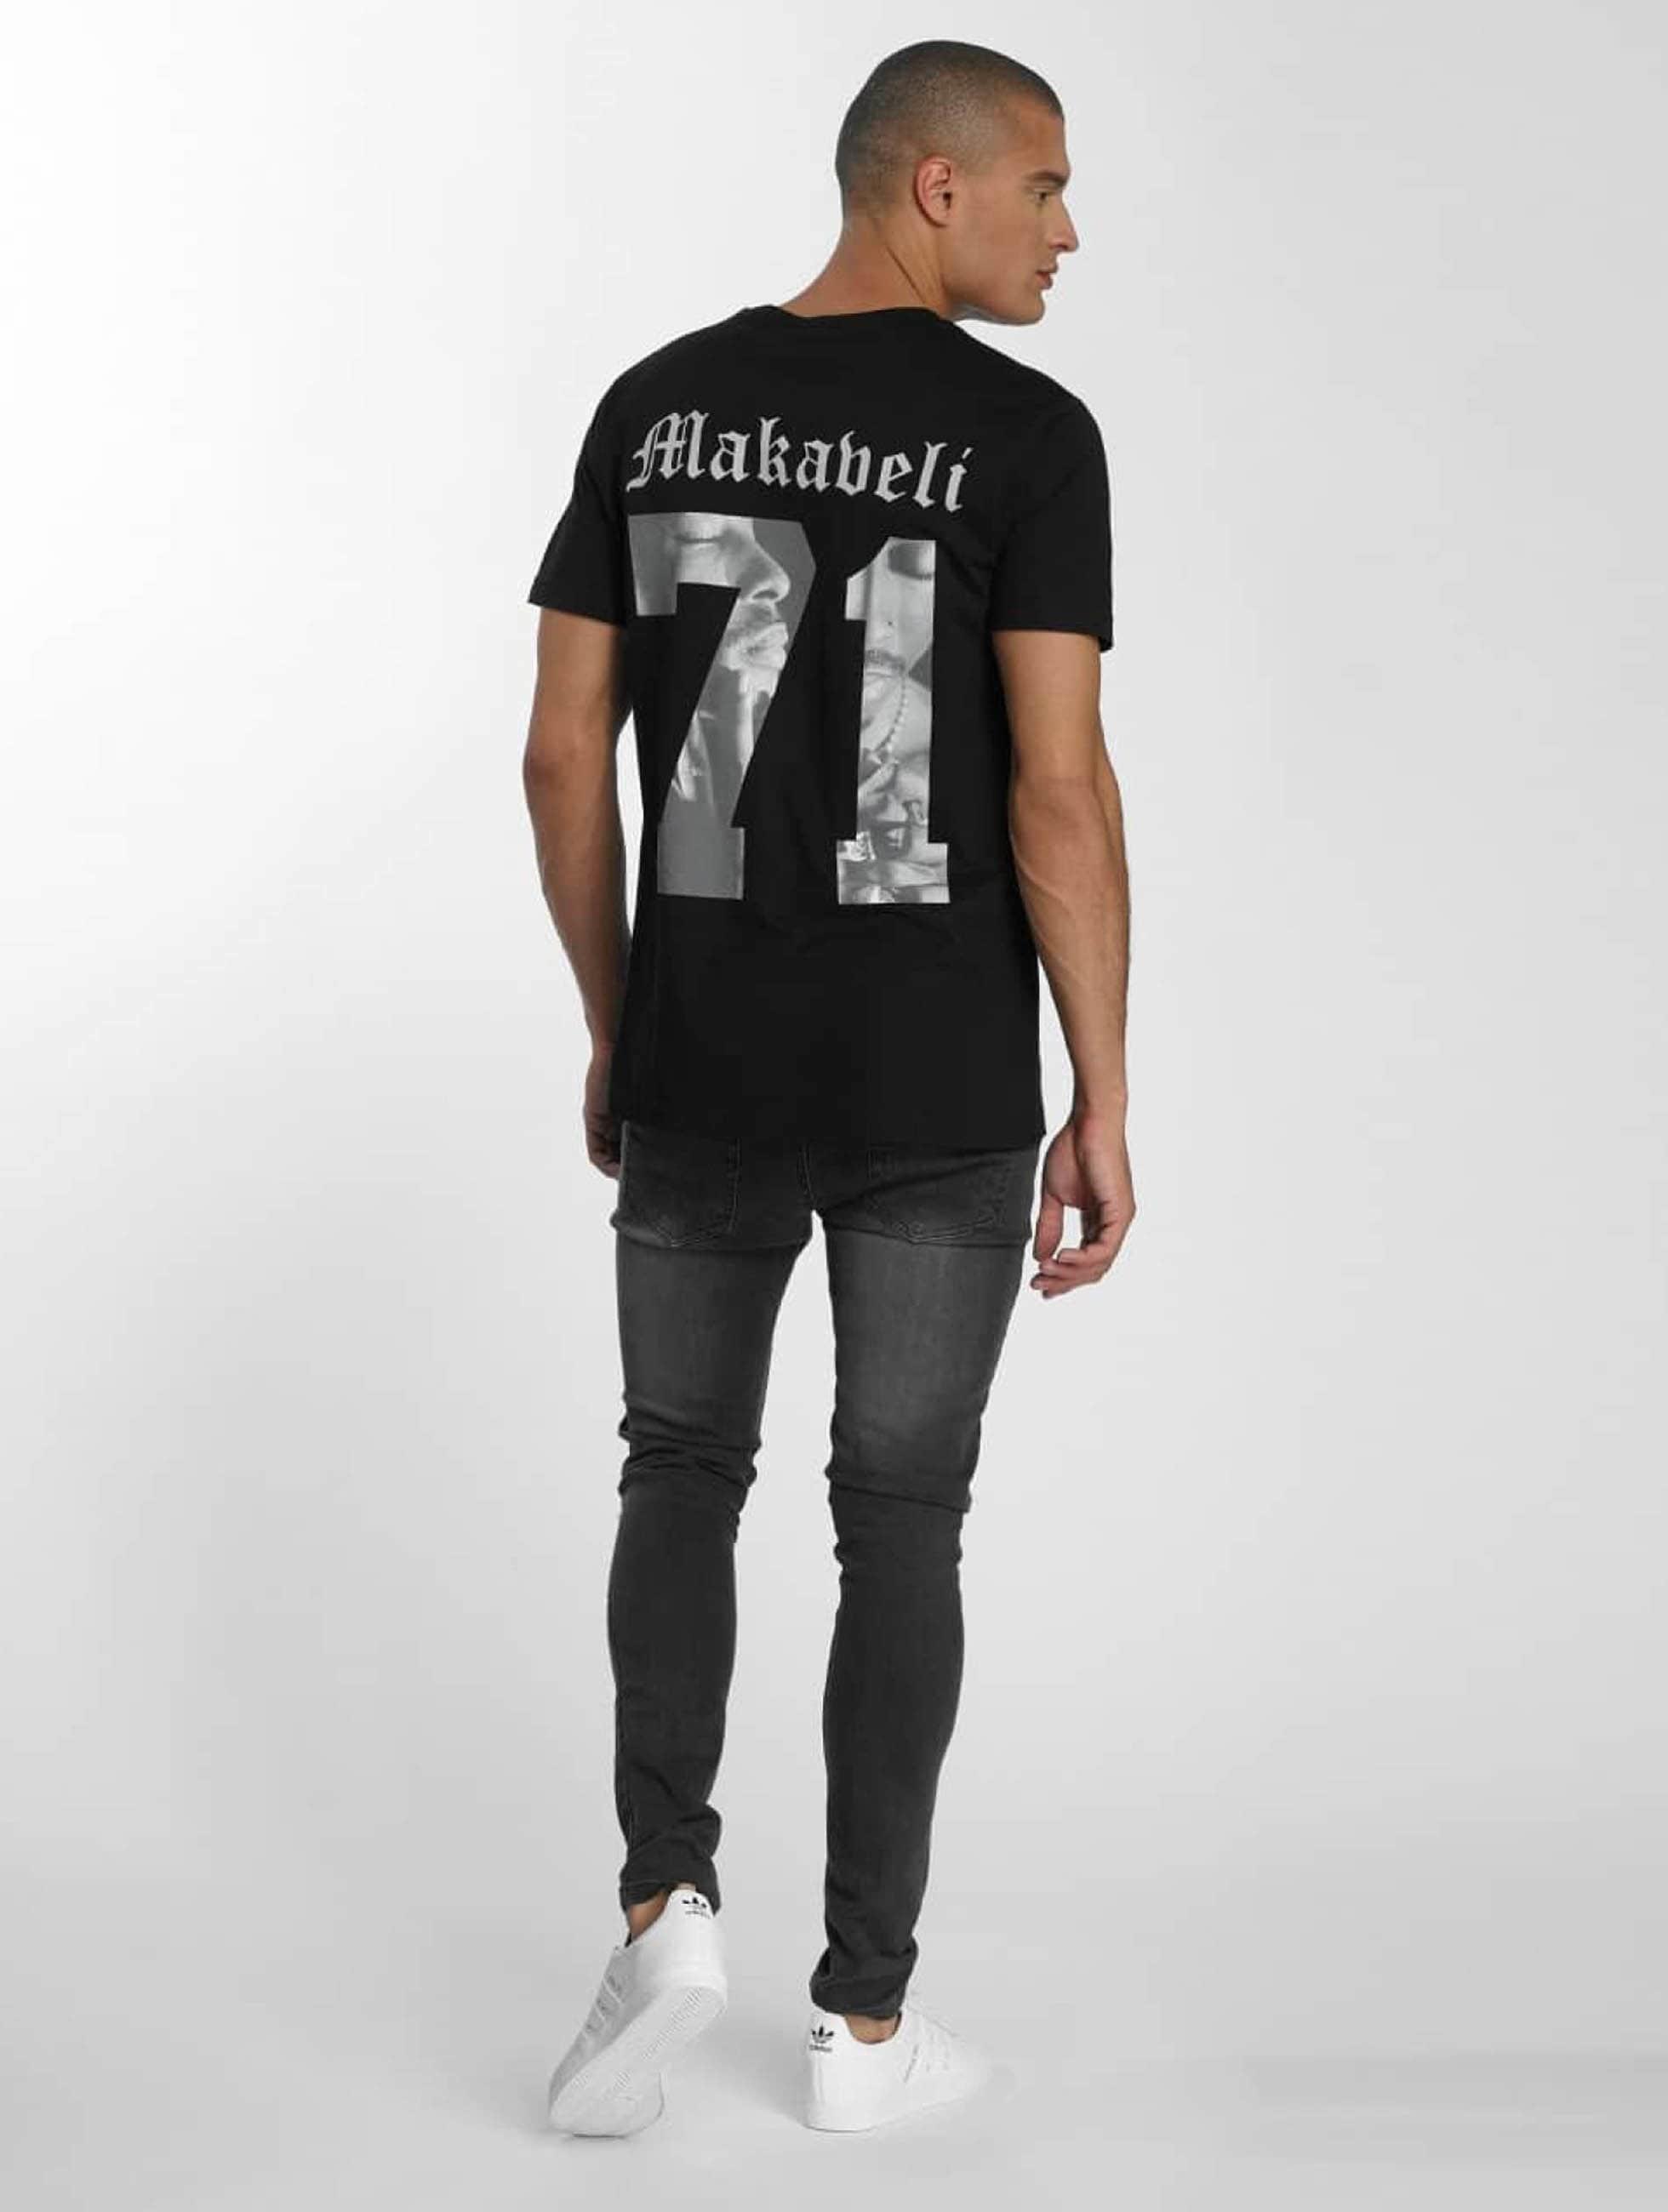 Mister-Tee-Uomini-Maglieria-T-shirt-Tupac-Makaveli